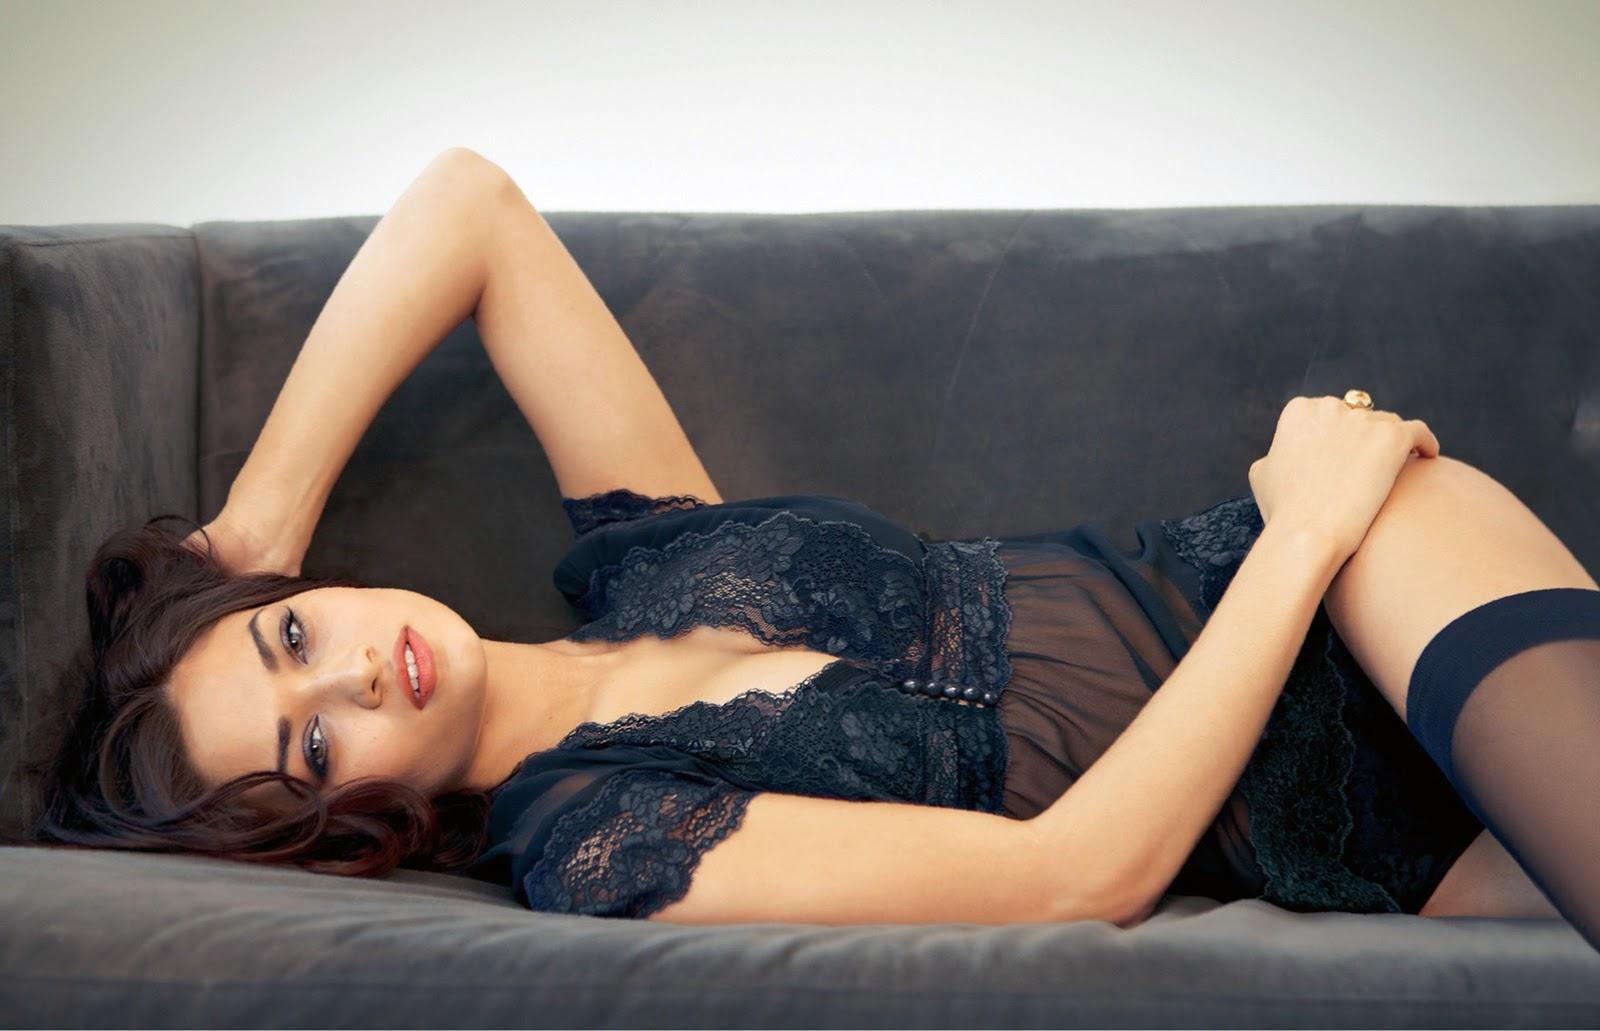 Shanina Shaik ~ MY SEXIEST WOMEN